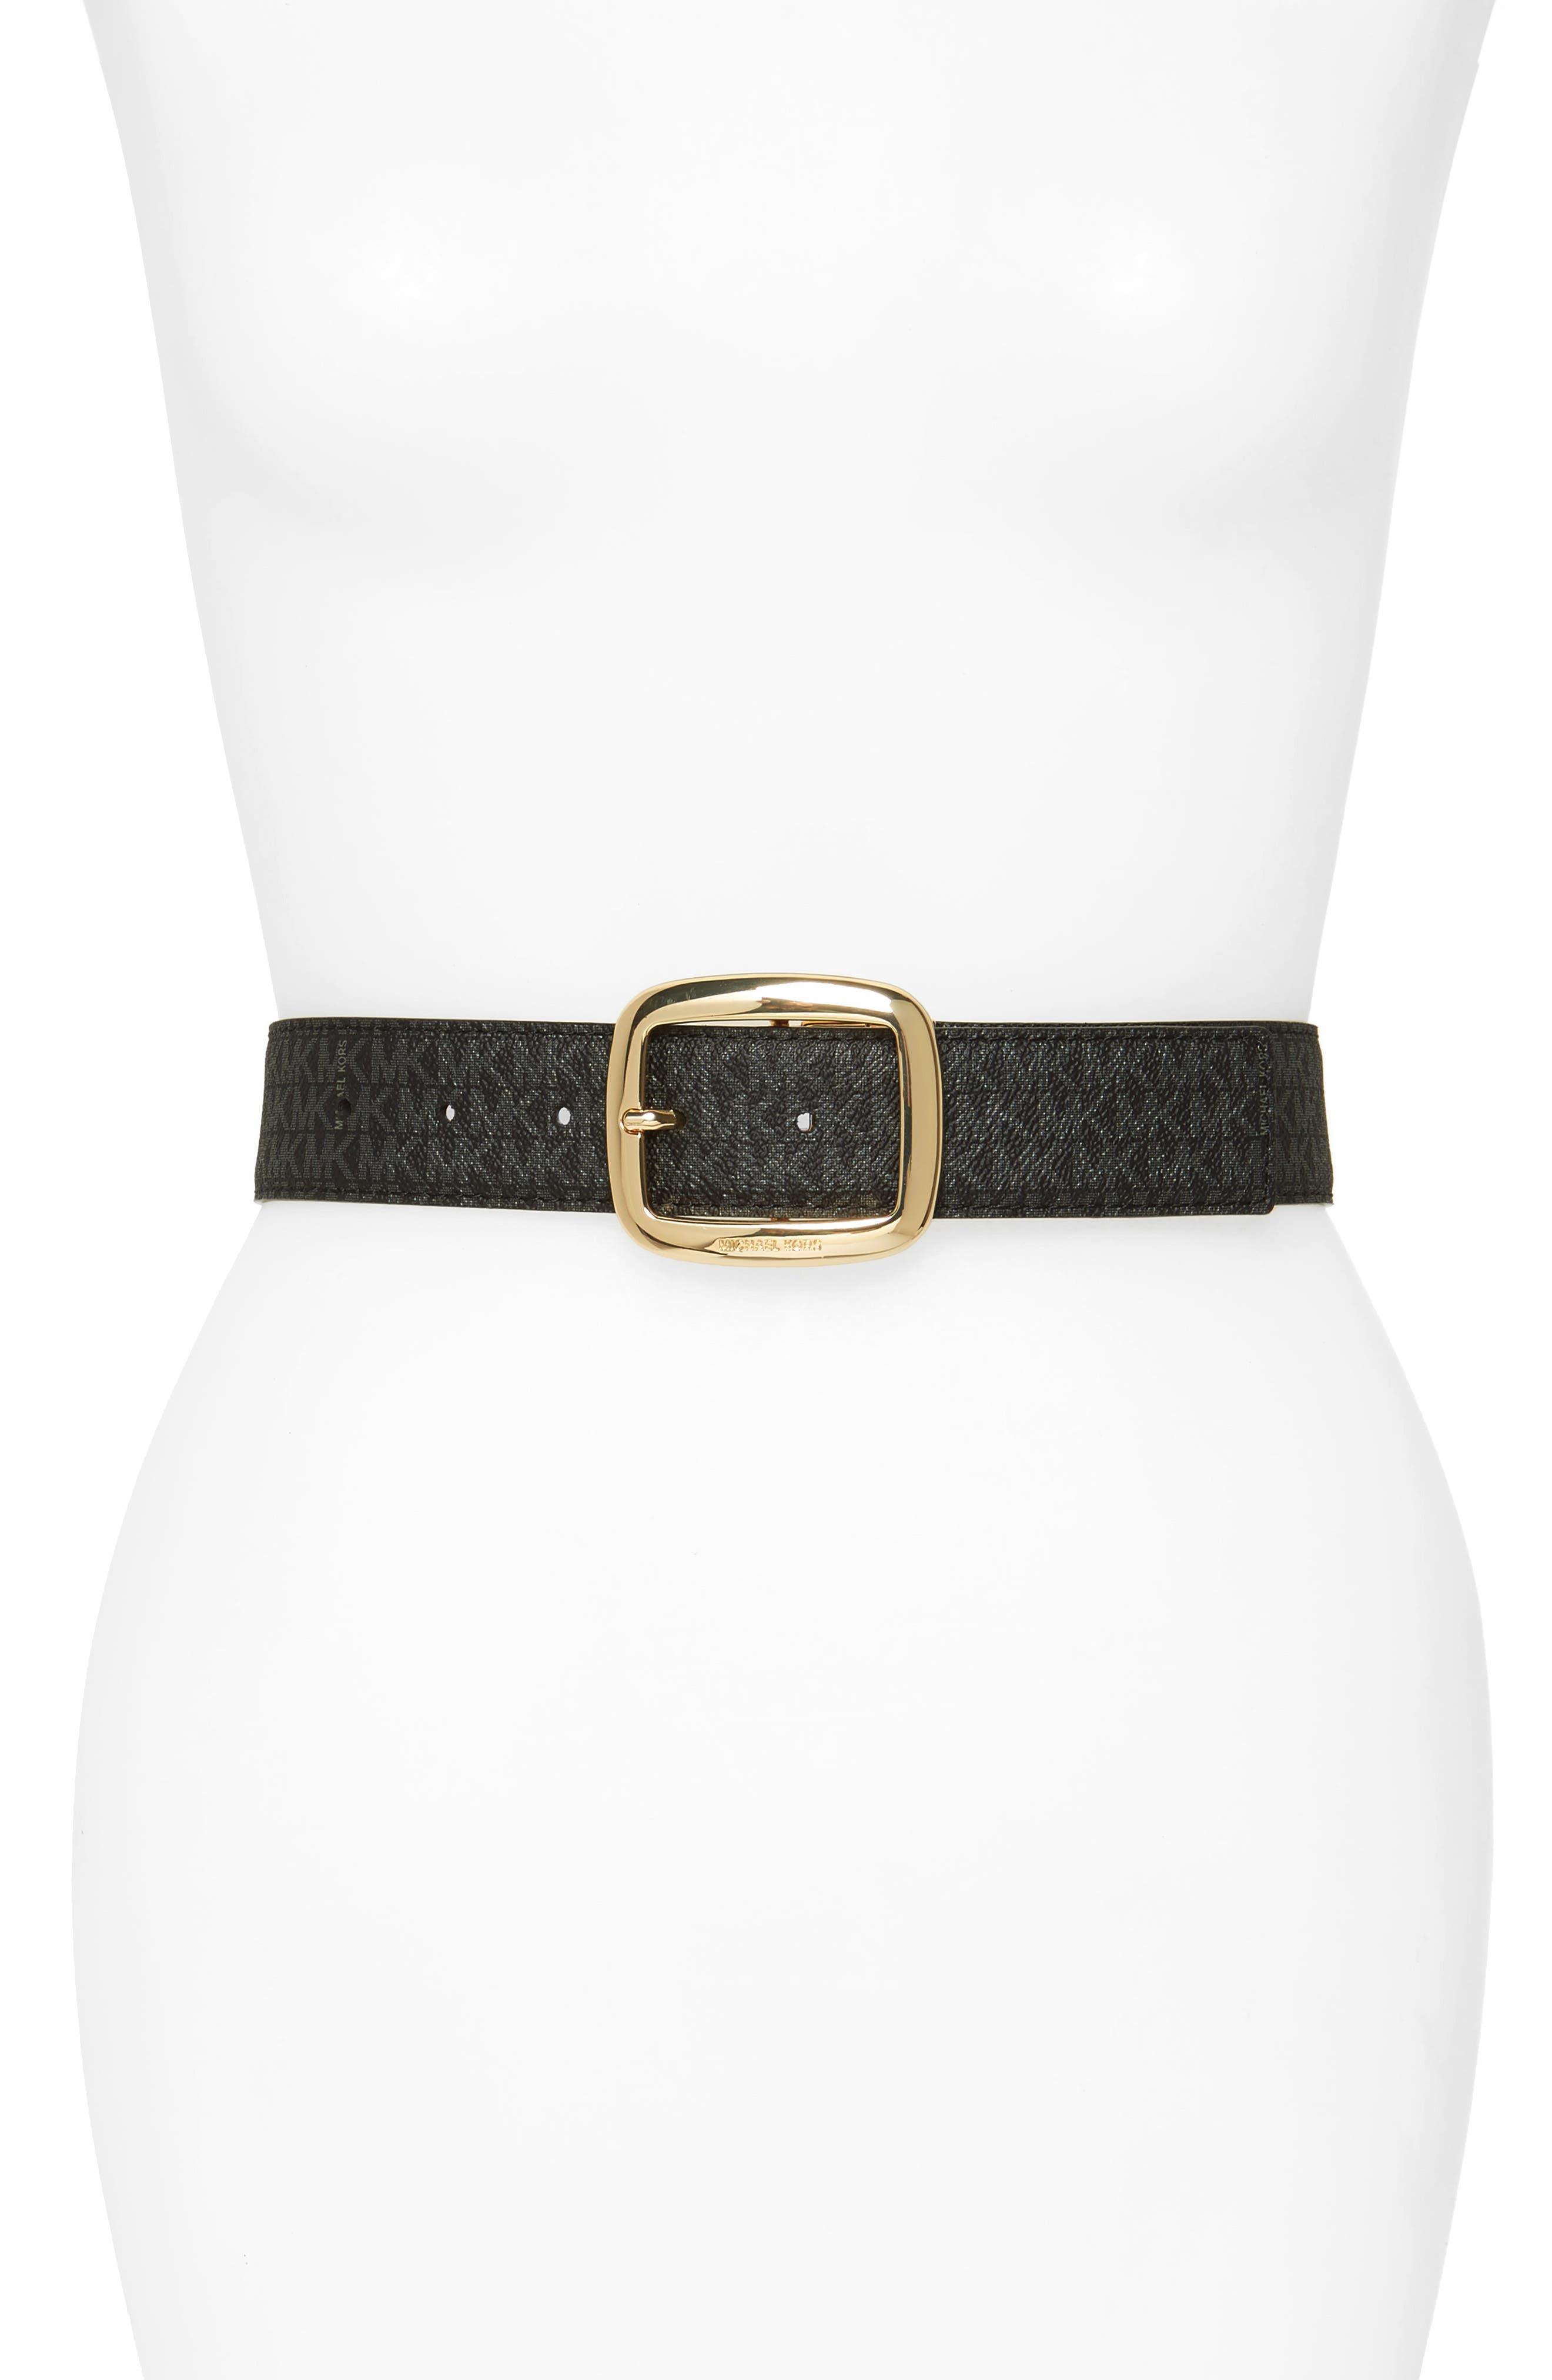 MICHAEL MICHAEL KORS, Logo Reversible Calfskin Leather Belt, Main thumbnail 1, color, BLACK/ ACORN